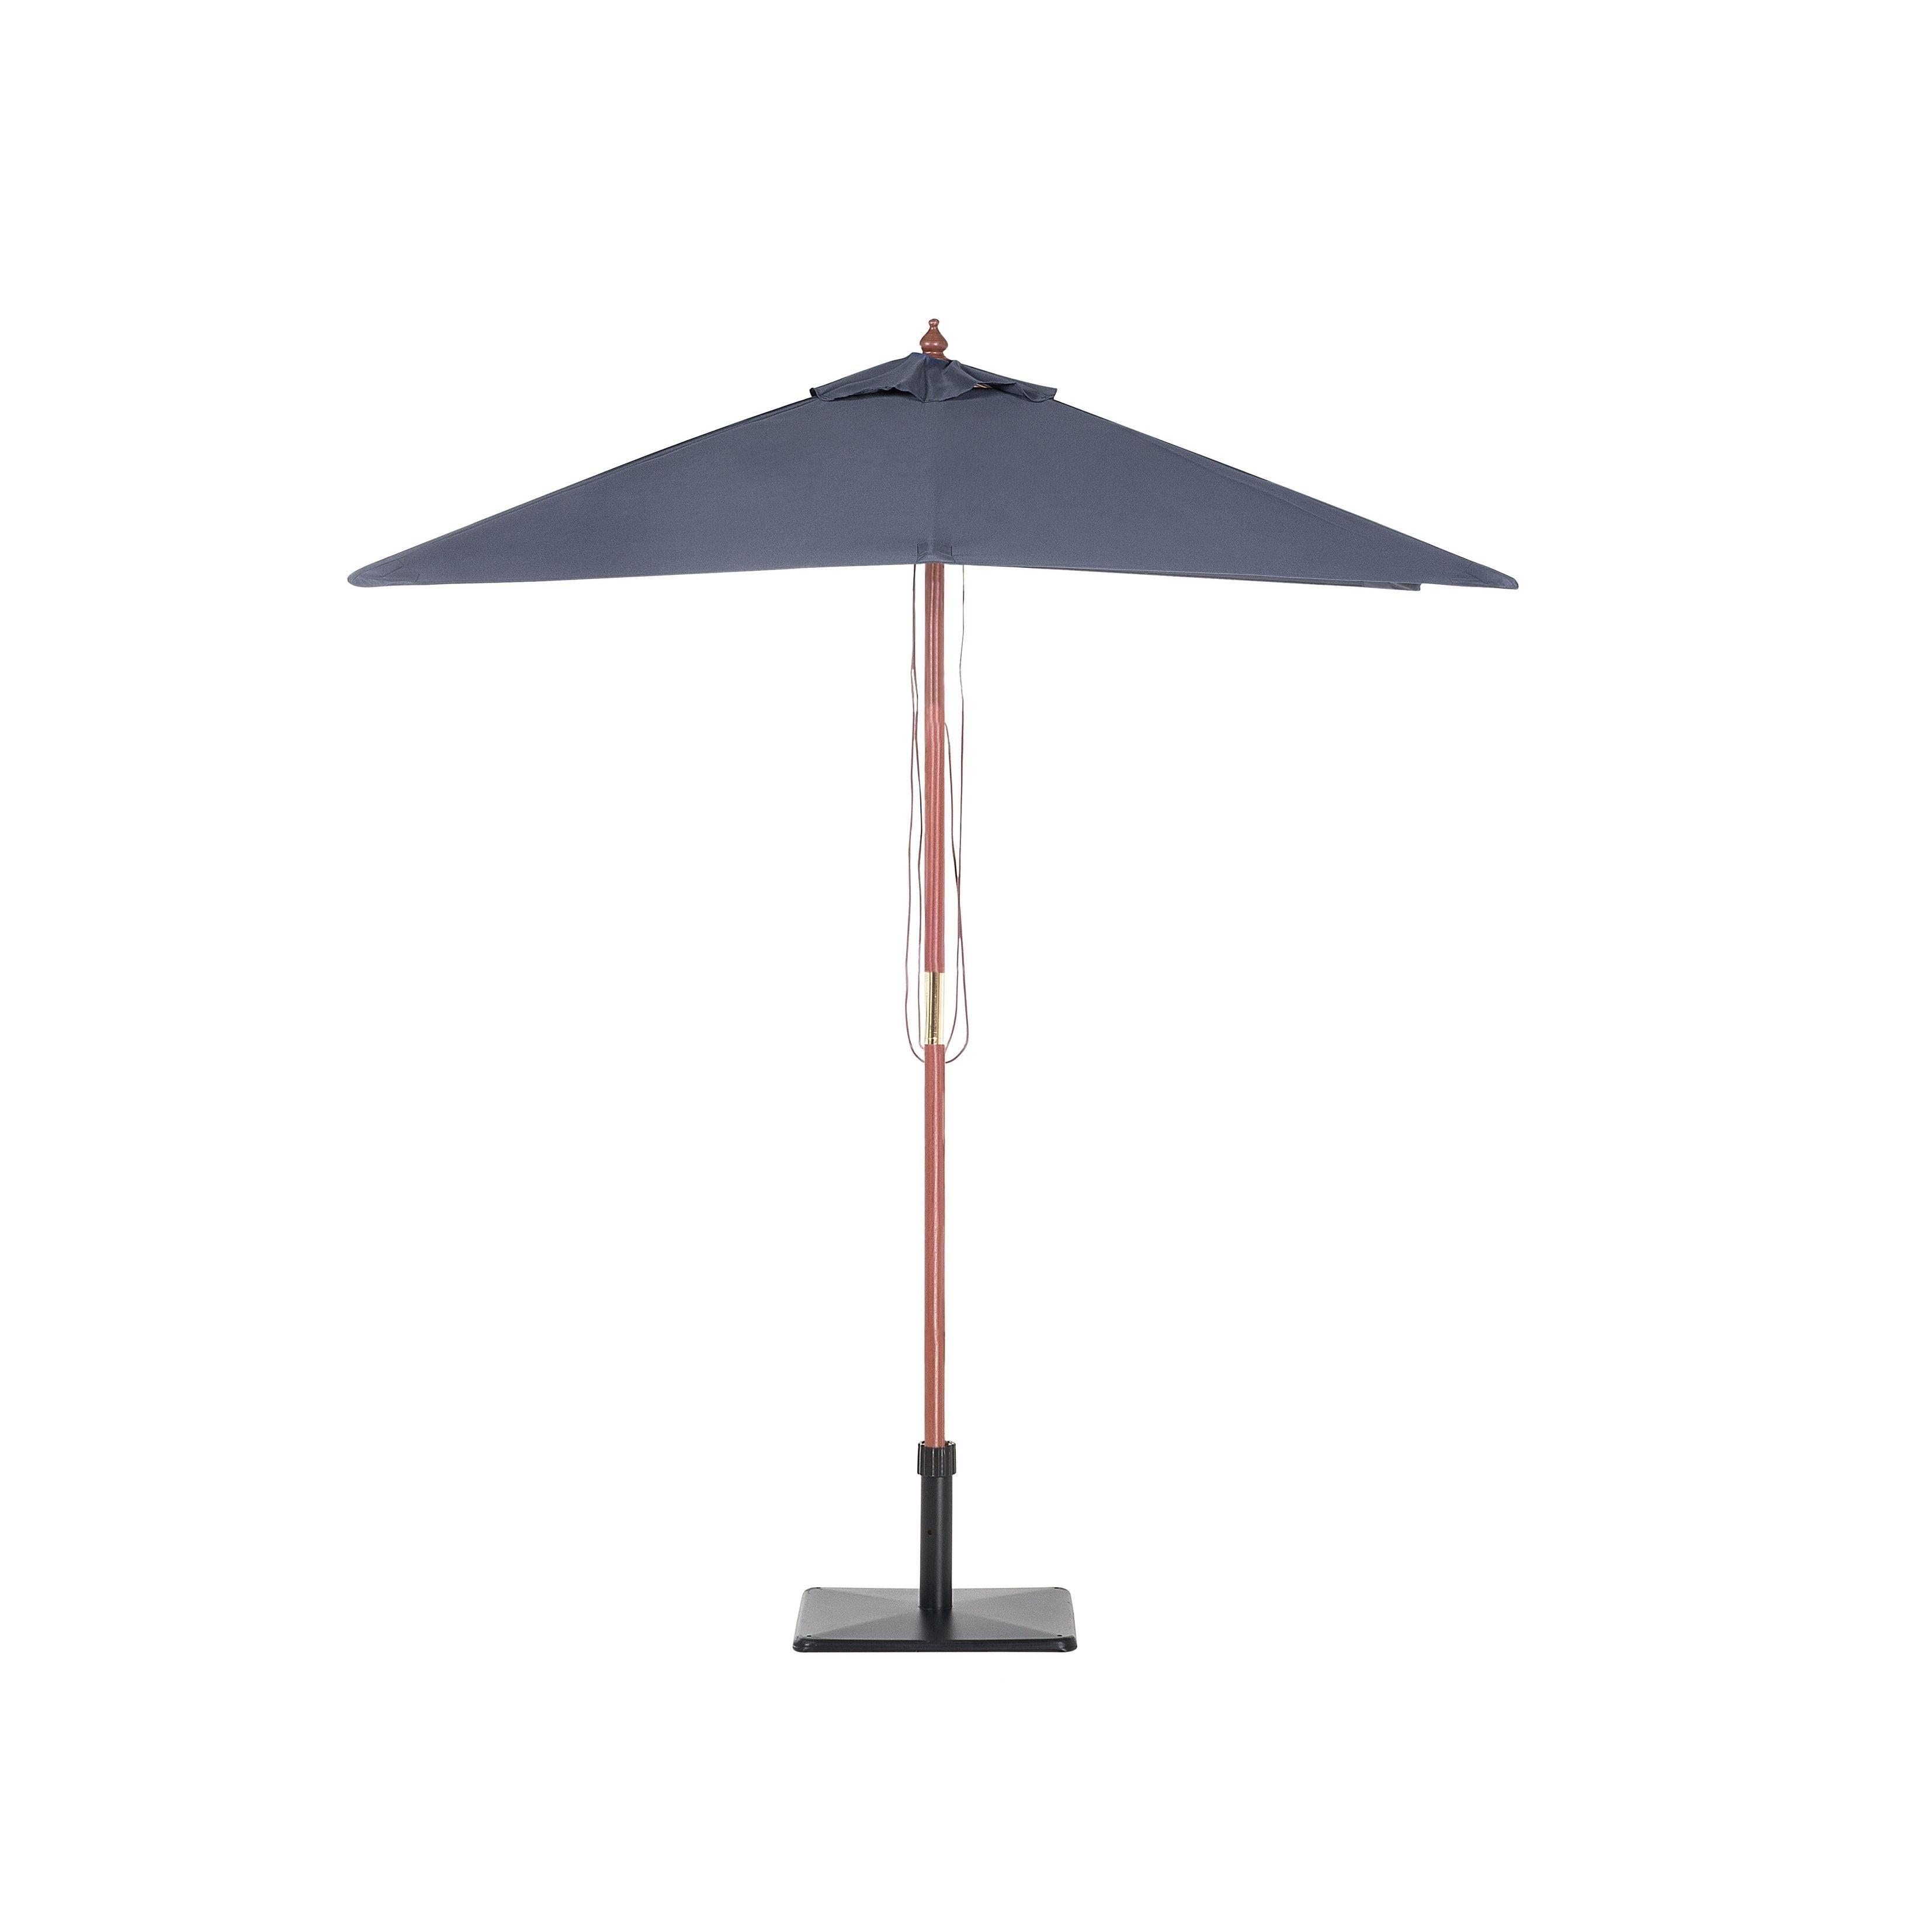 Beliani Patio Market Umbrella Gray Flamenco, Size 8 Ft